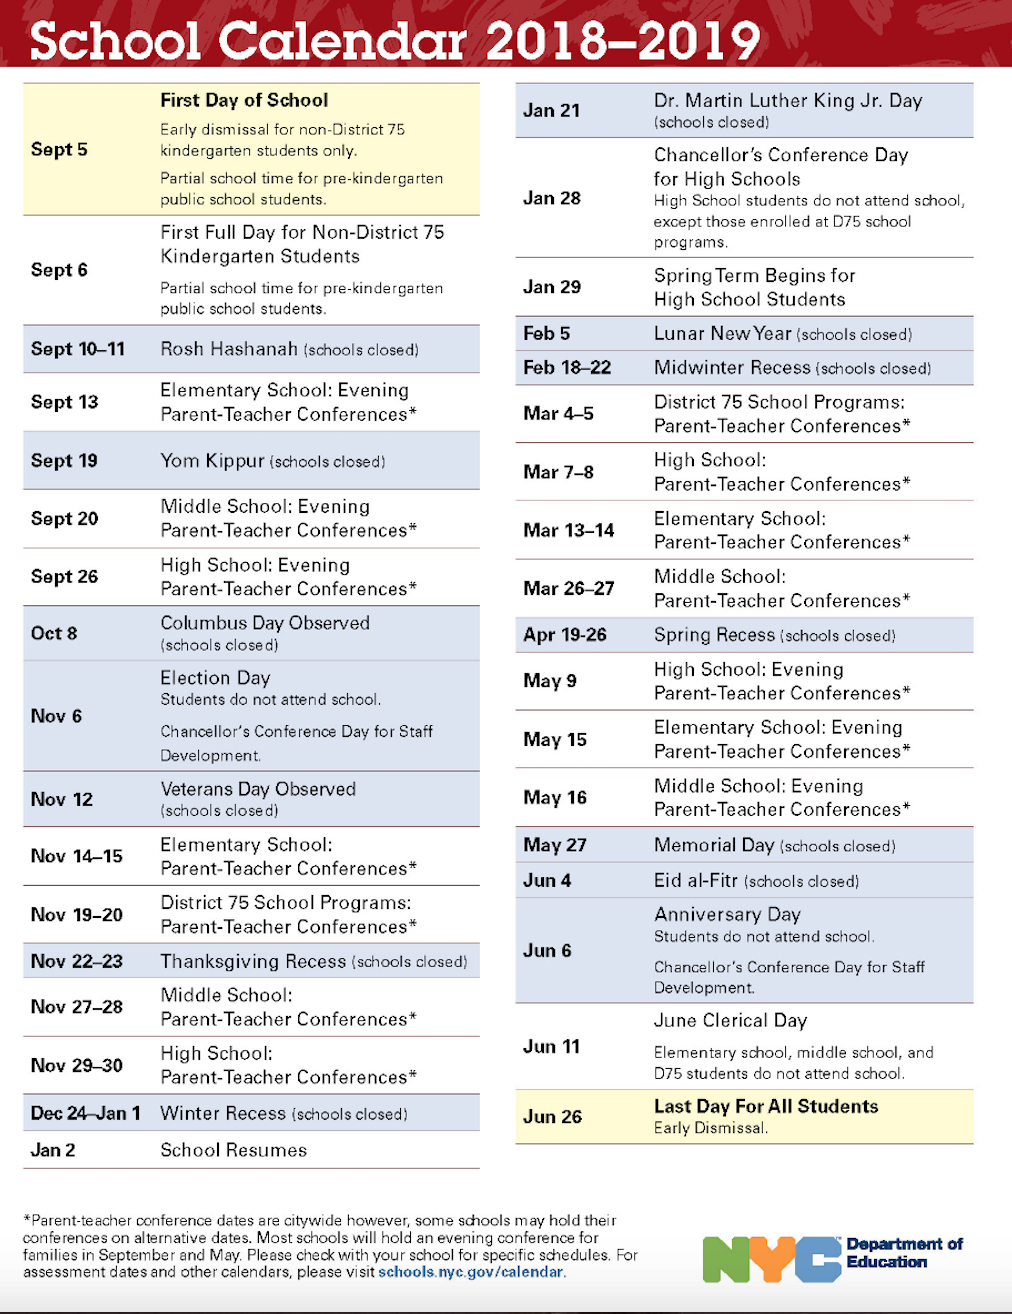 Nyc Doe 2018 2019 School Calendar | Ps 373R Robert Randall With Regard To Nyc Dept Of Ed Calendar